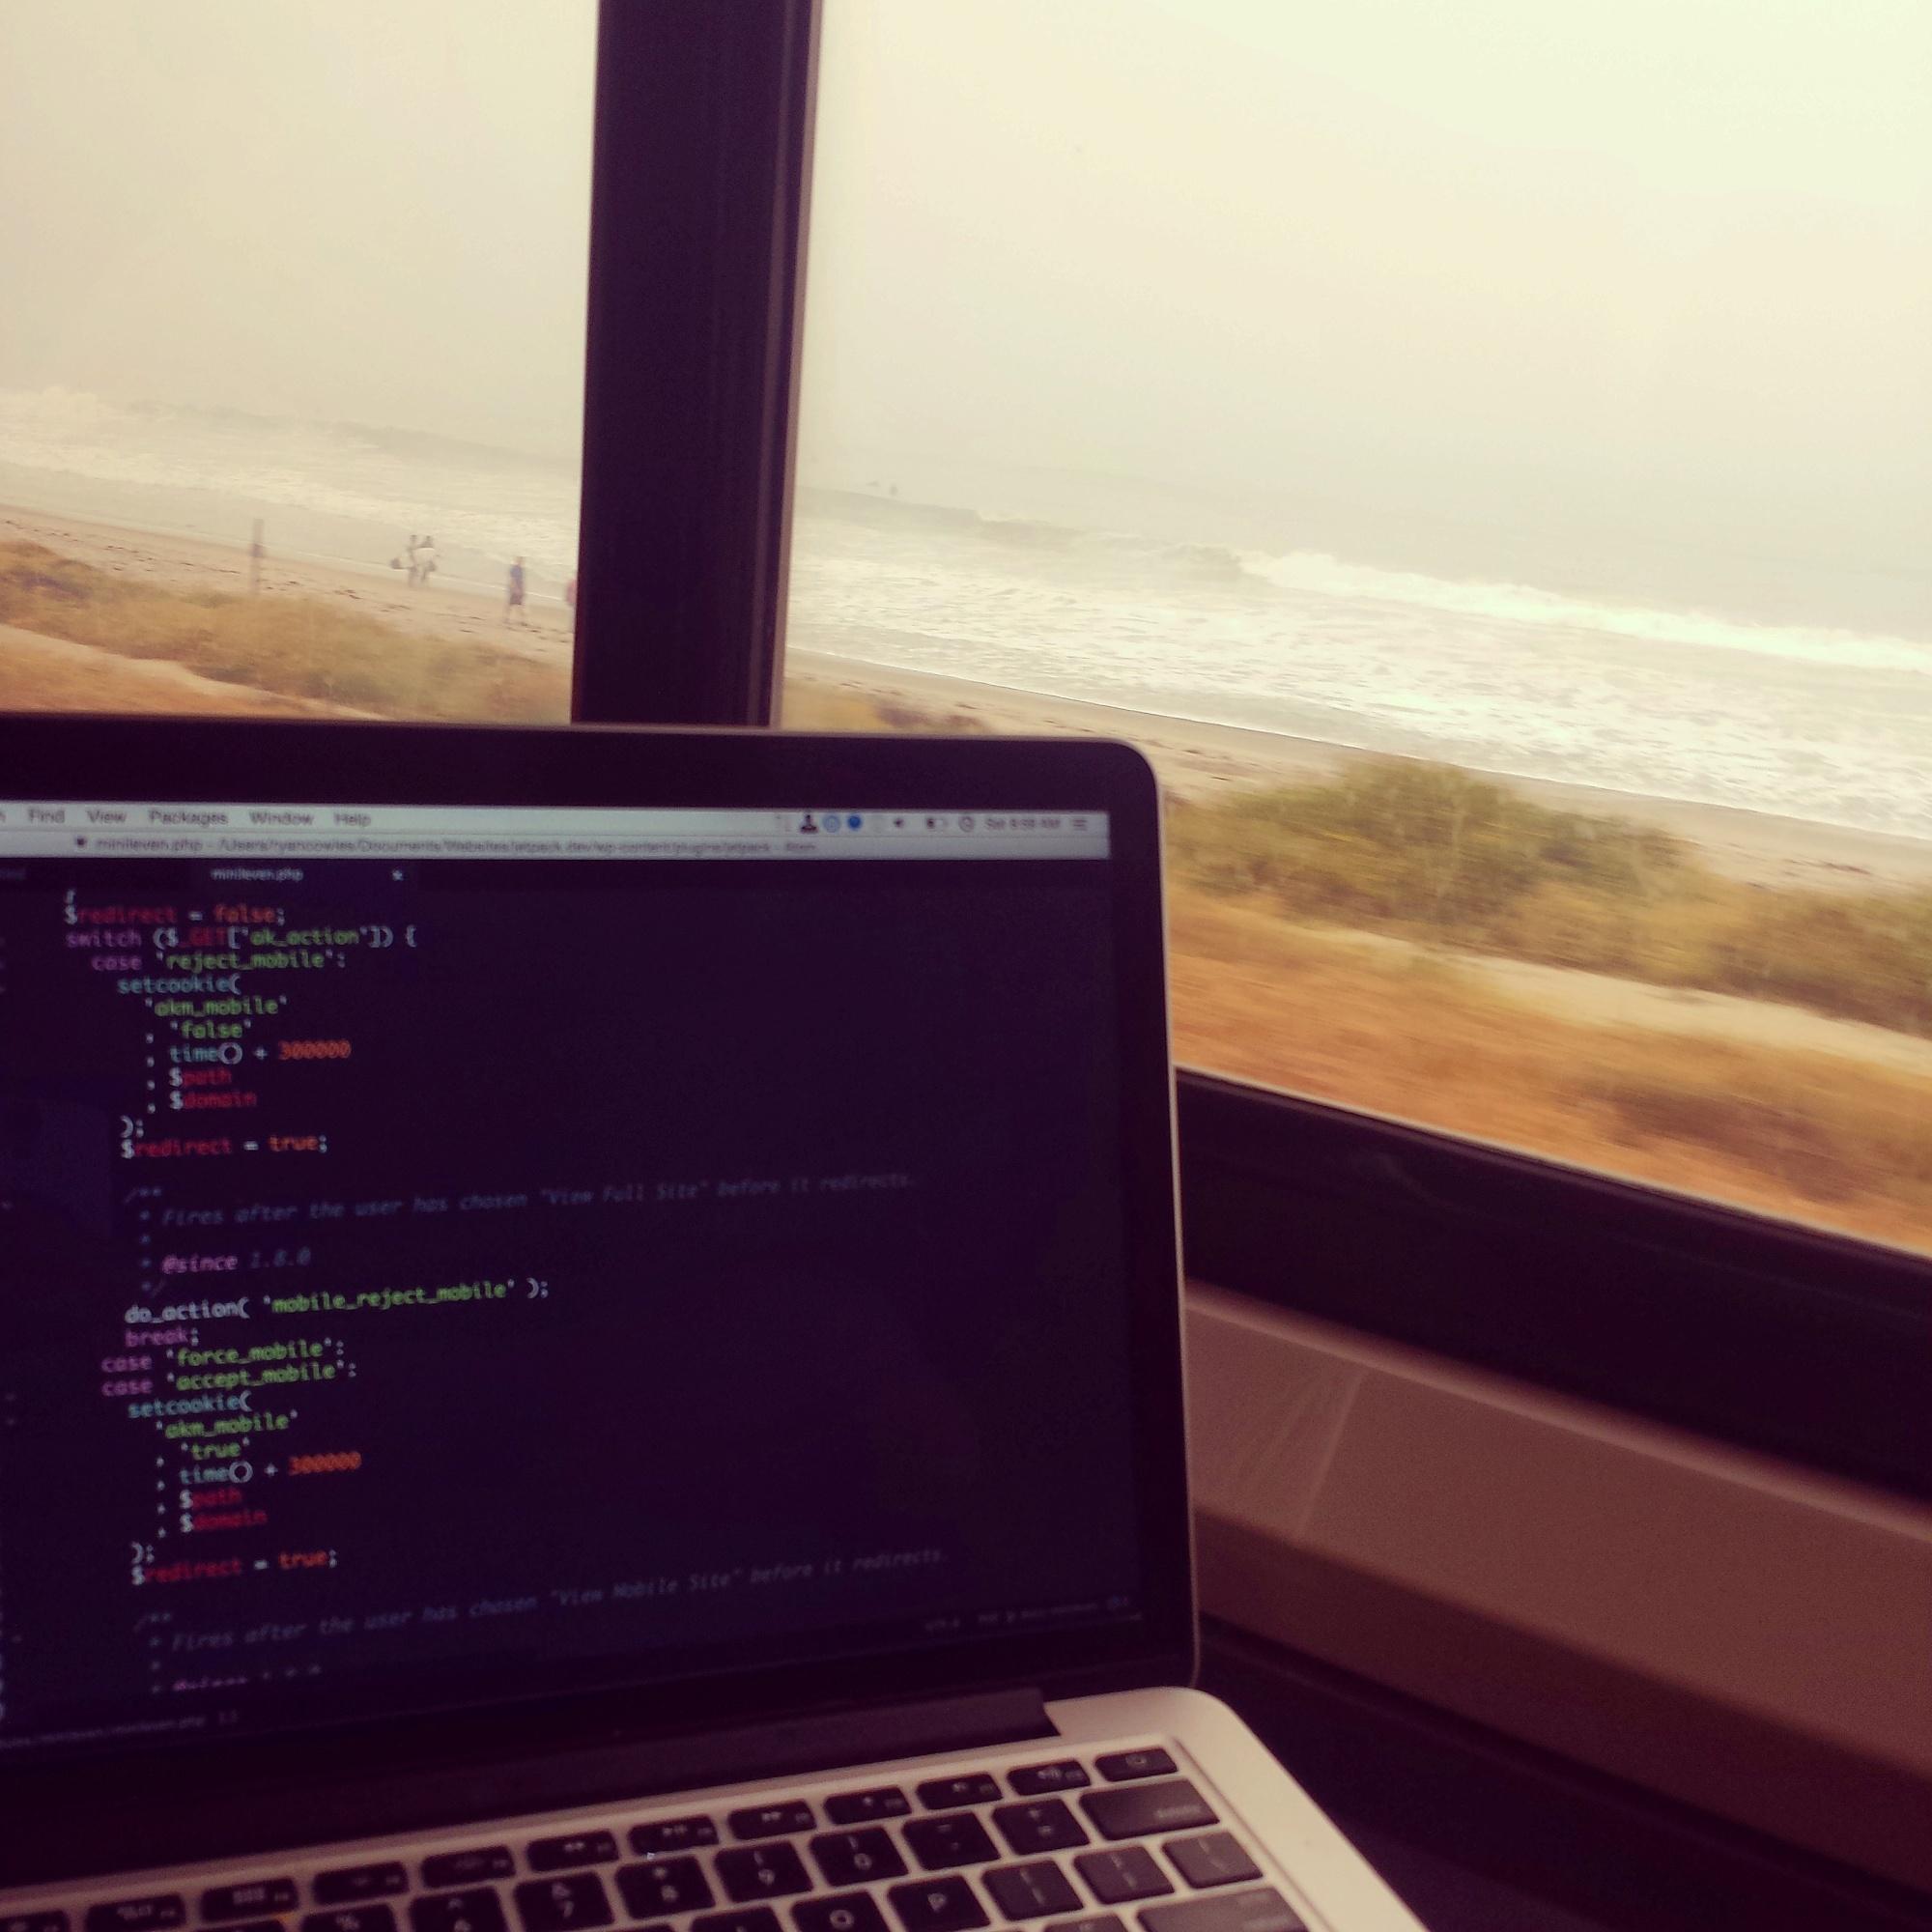 Working on Amtrak's Pacific Surfliner